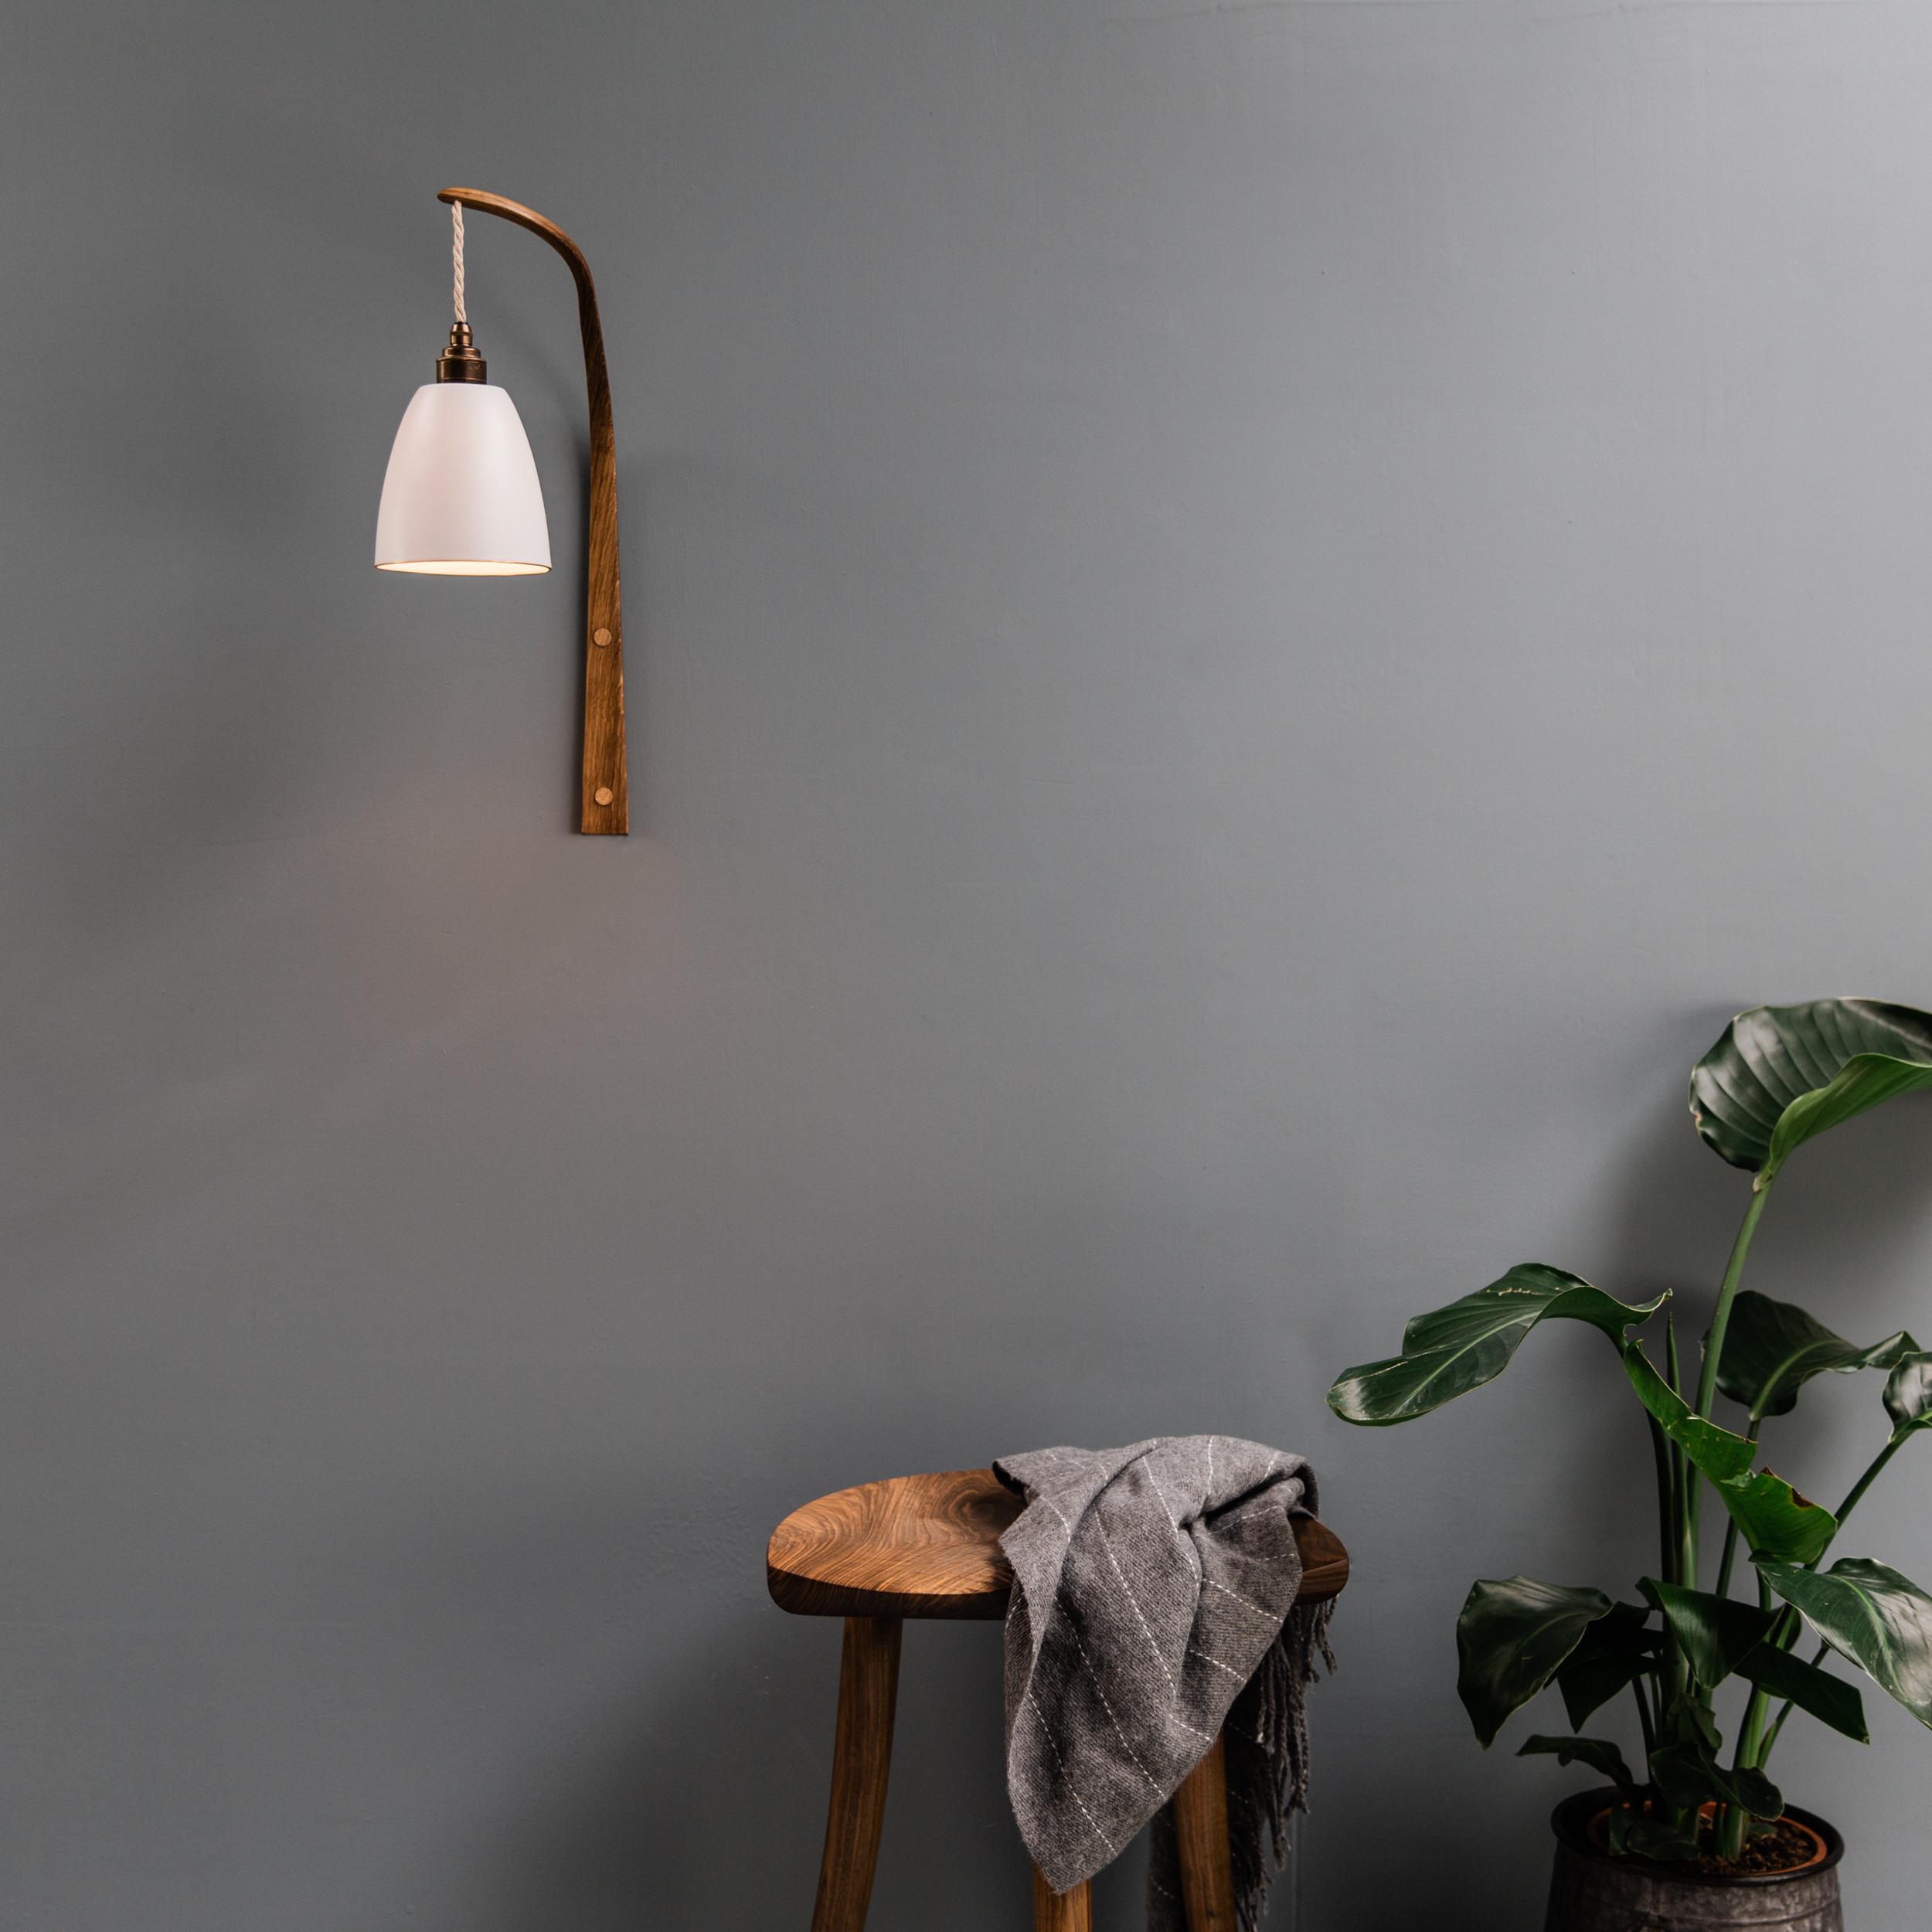 small wall light-1-2WEB SIZE.jpg